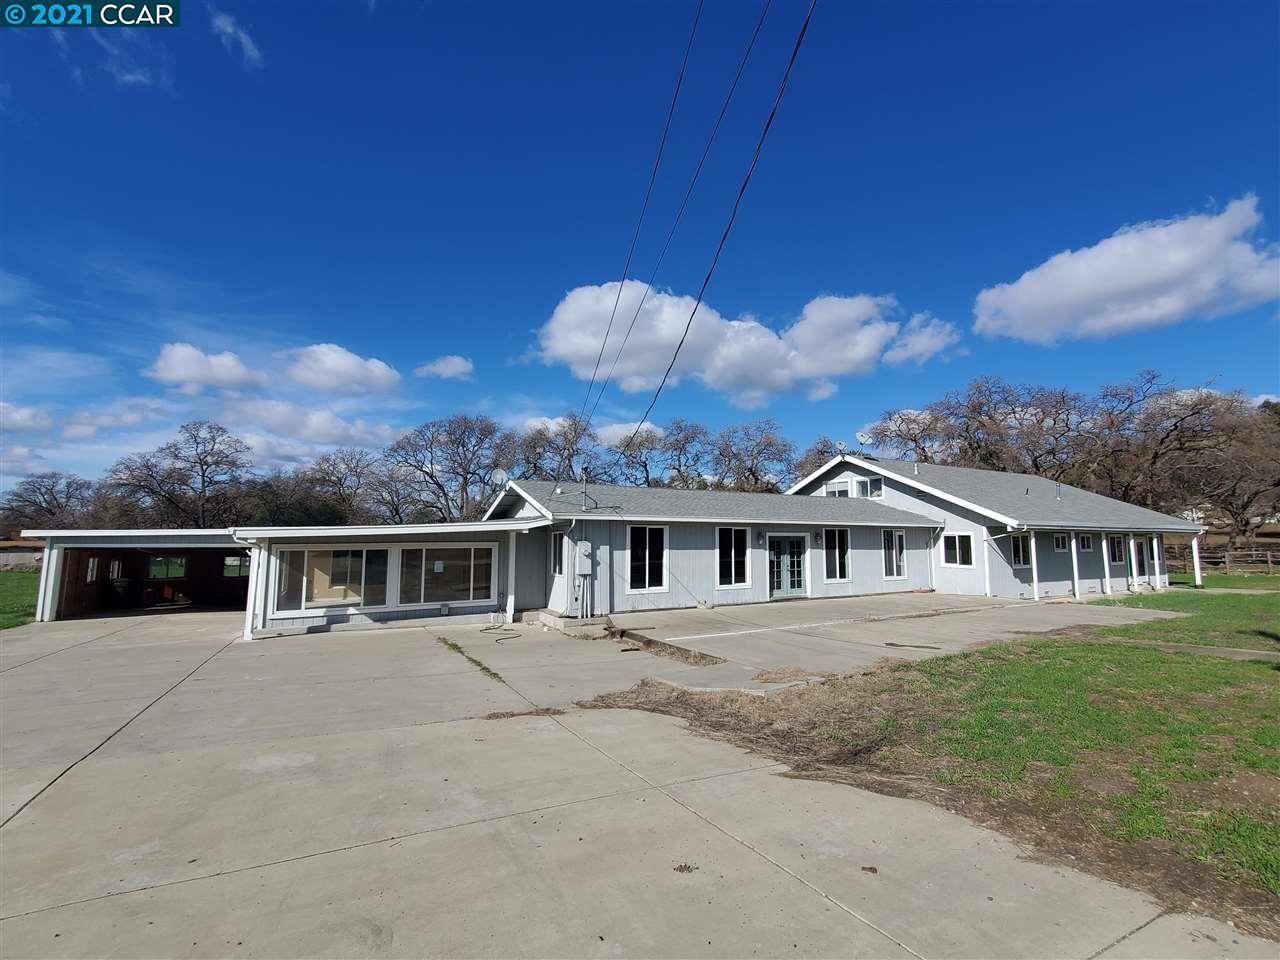 Photo for 1250 North Gate Rd, WALNUT CREEK, CA 94598 (MLS # 40938754)